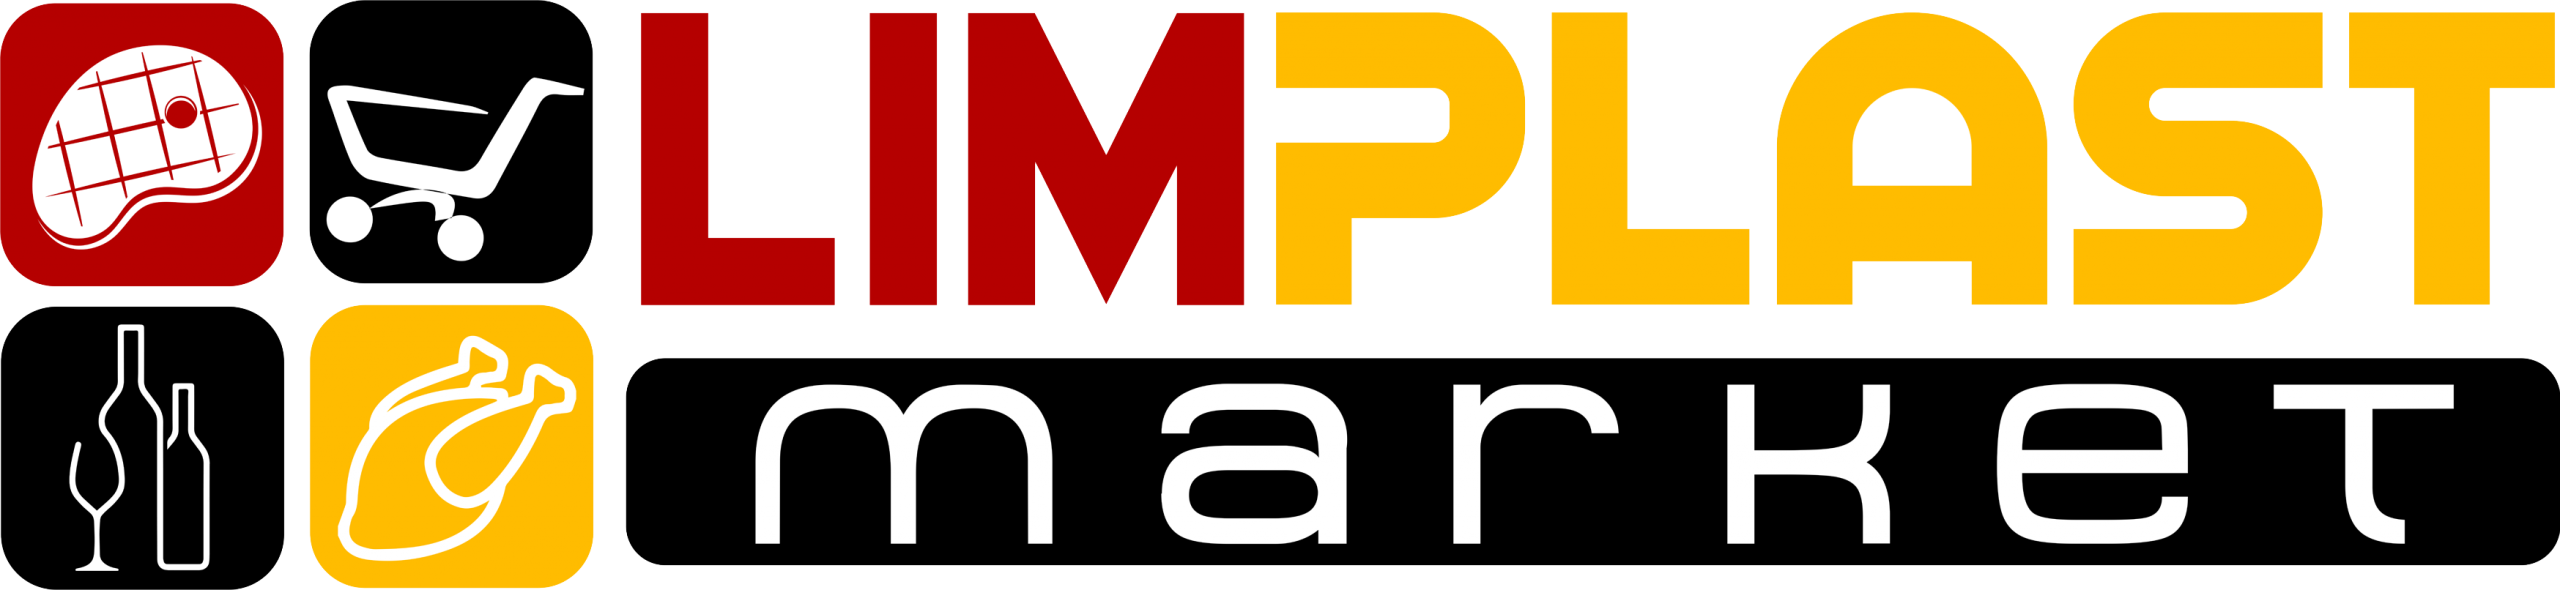 Implast